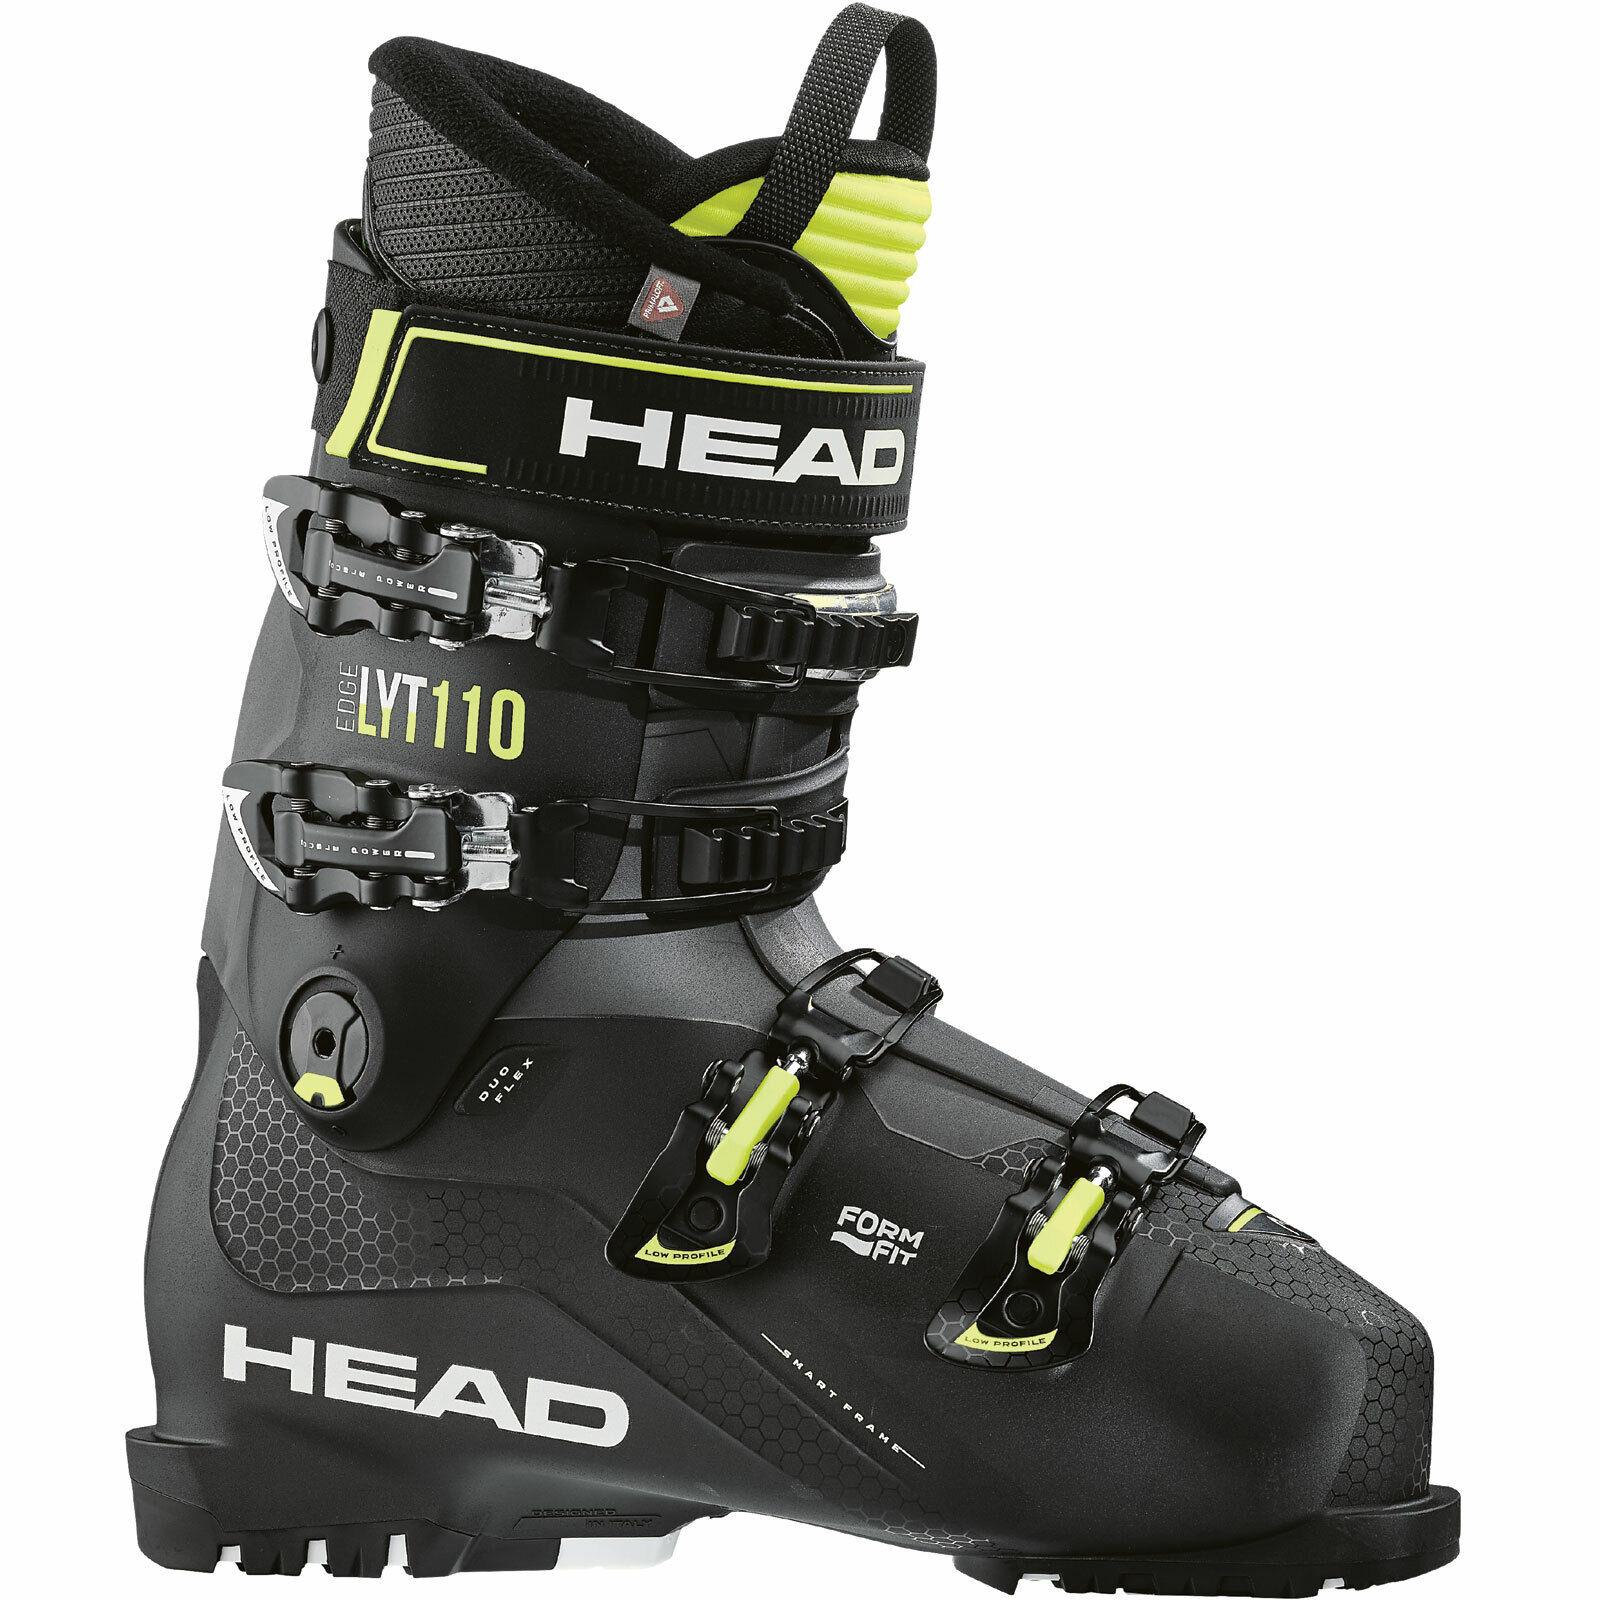 Head Edge Lyt 110 Herren-Skistiefel Skischuhe Skiboots Pisten-Schuhe Ski Alpin